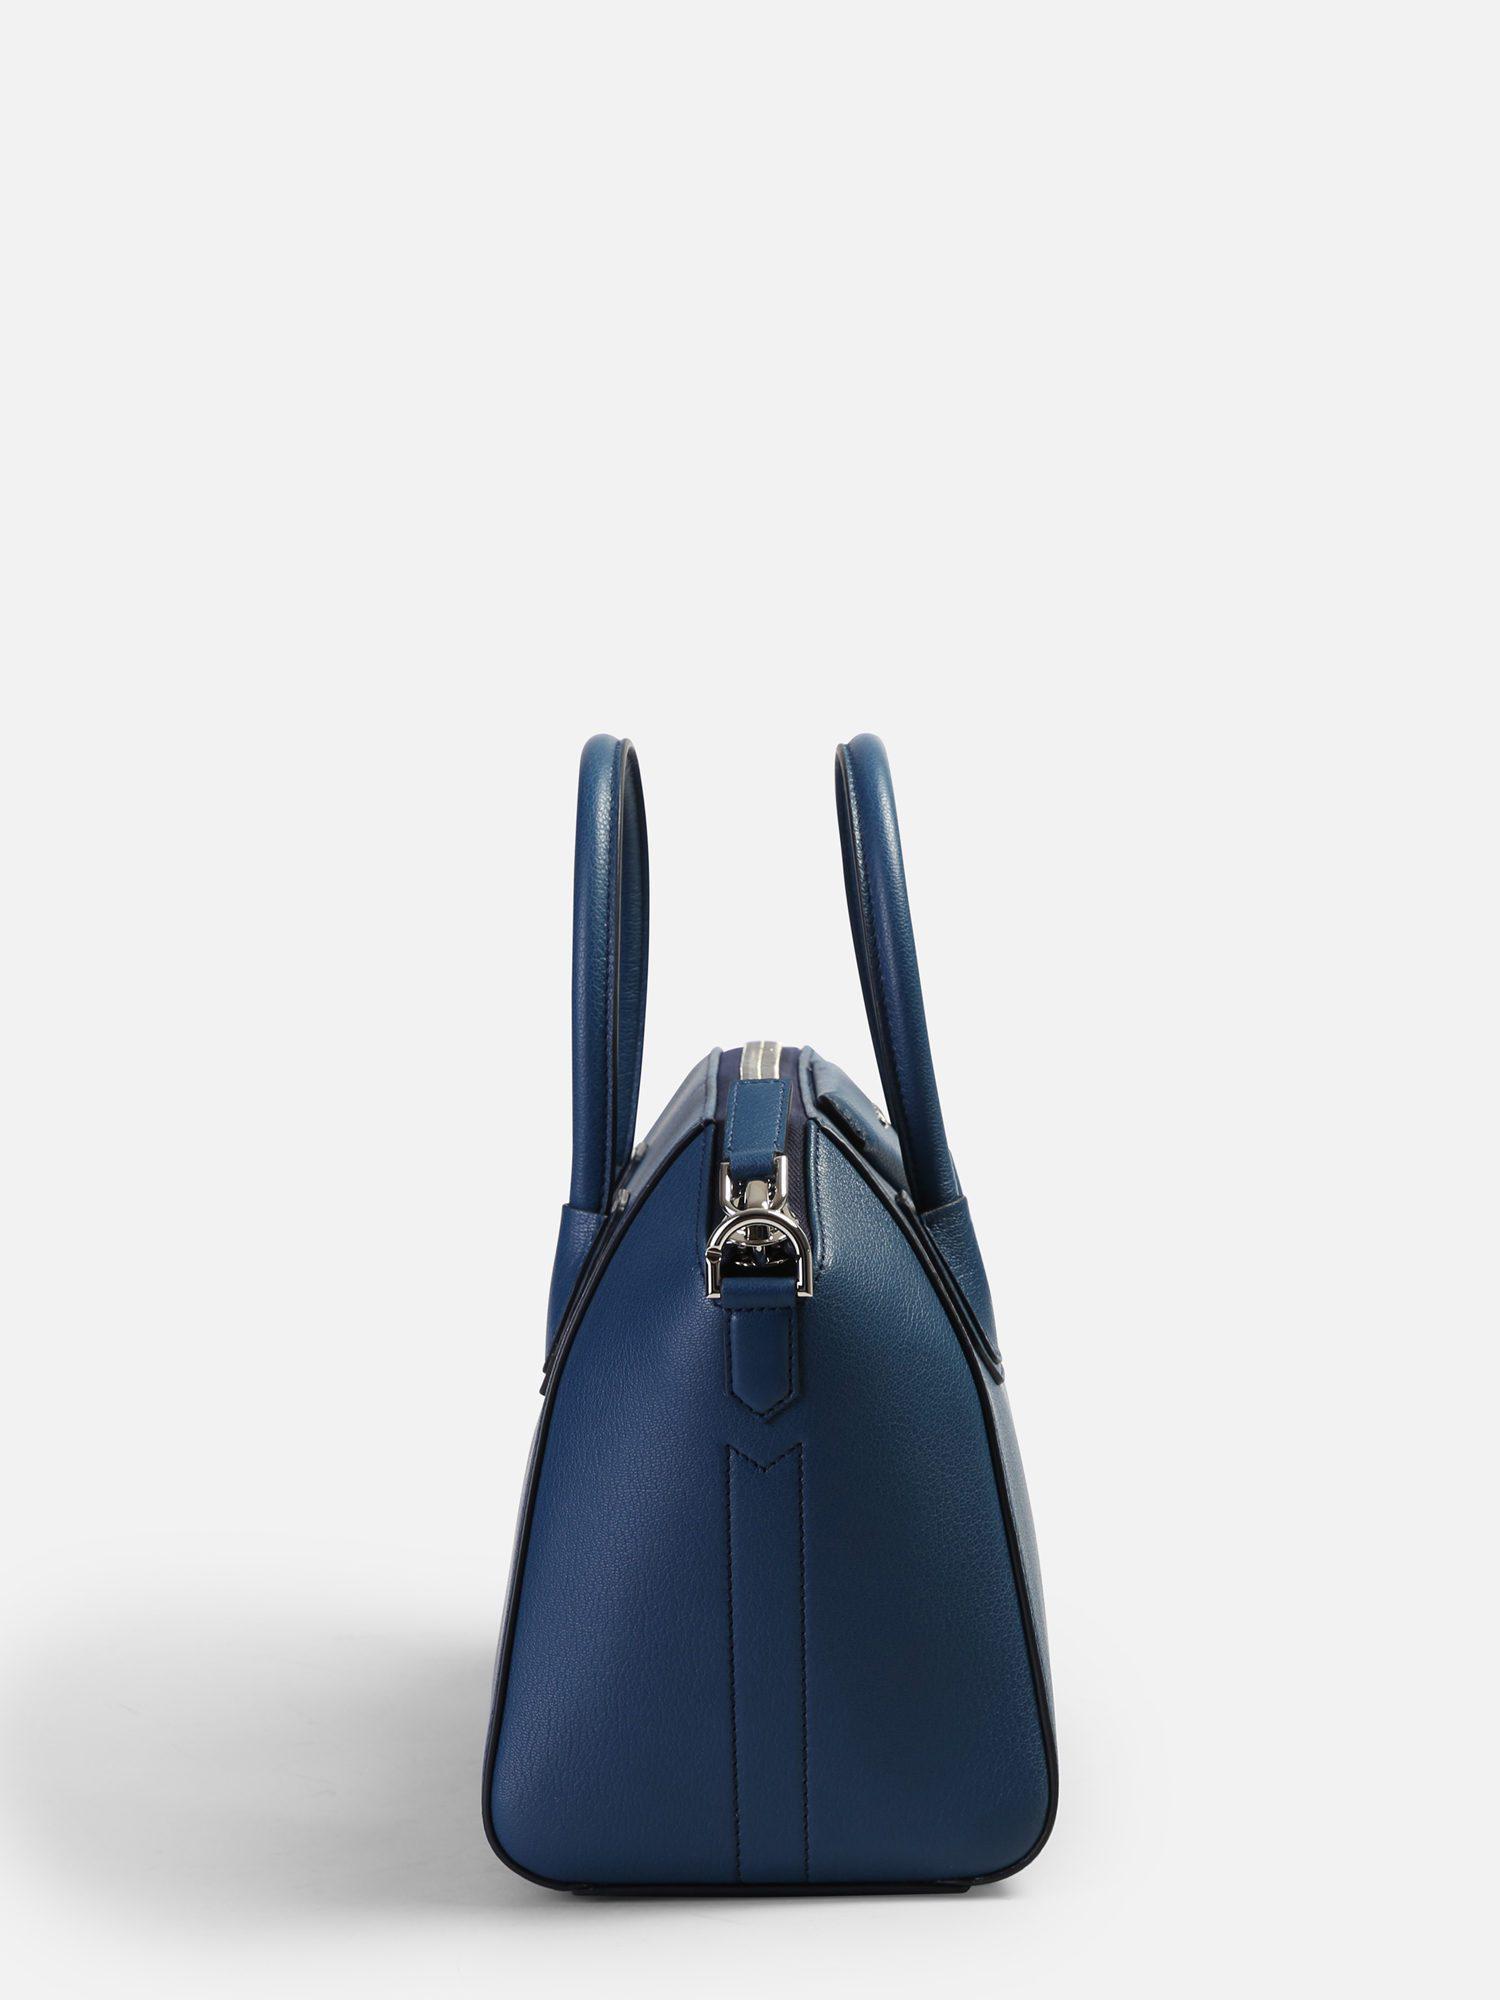 Givenchy Small Antigona Leather Bag in Blue - Lyst fe07cd1b37